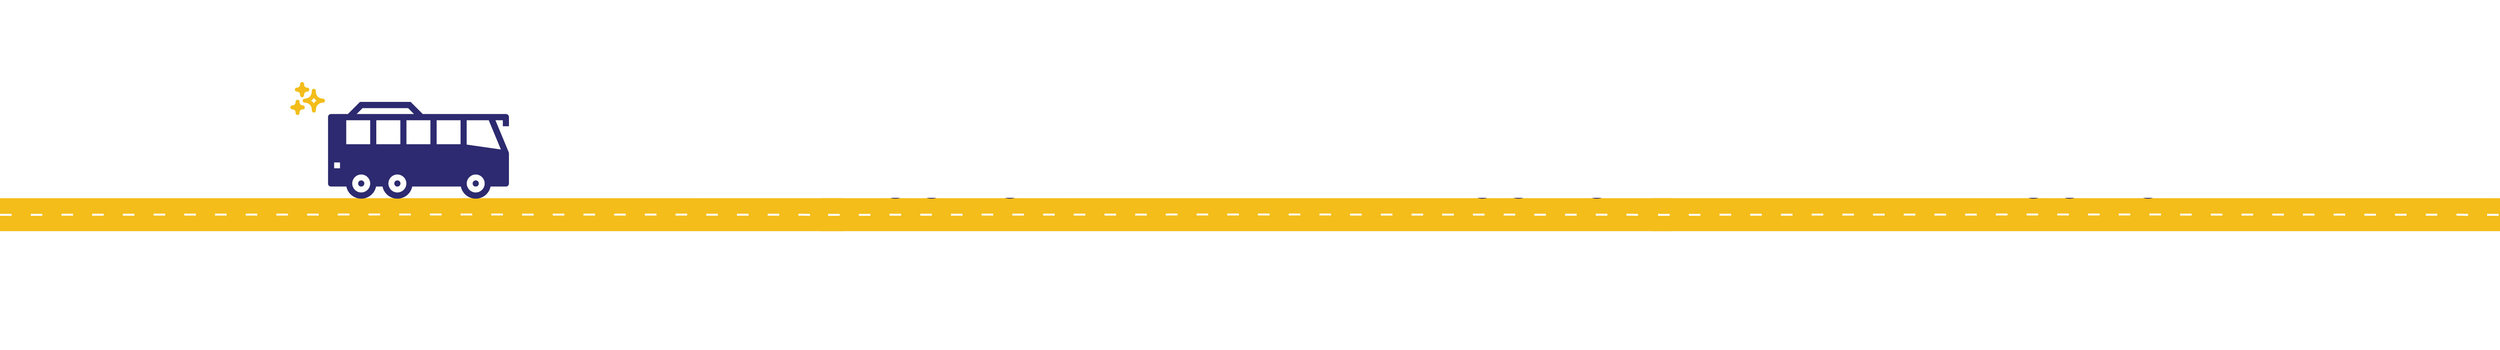 noleggio autobus pullman piemonte trasporto piemonte bip card gruppo biffo sac nuova saar piemonte cuneo bra torino.jpg